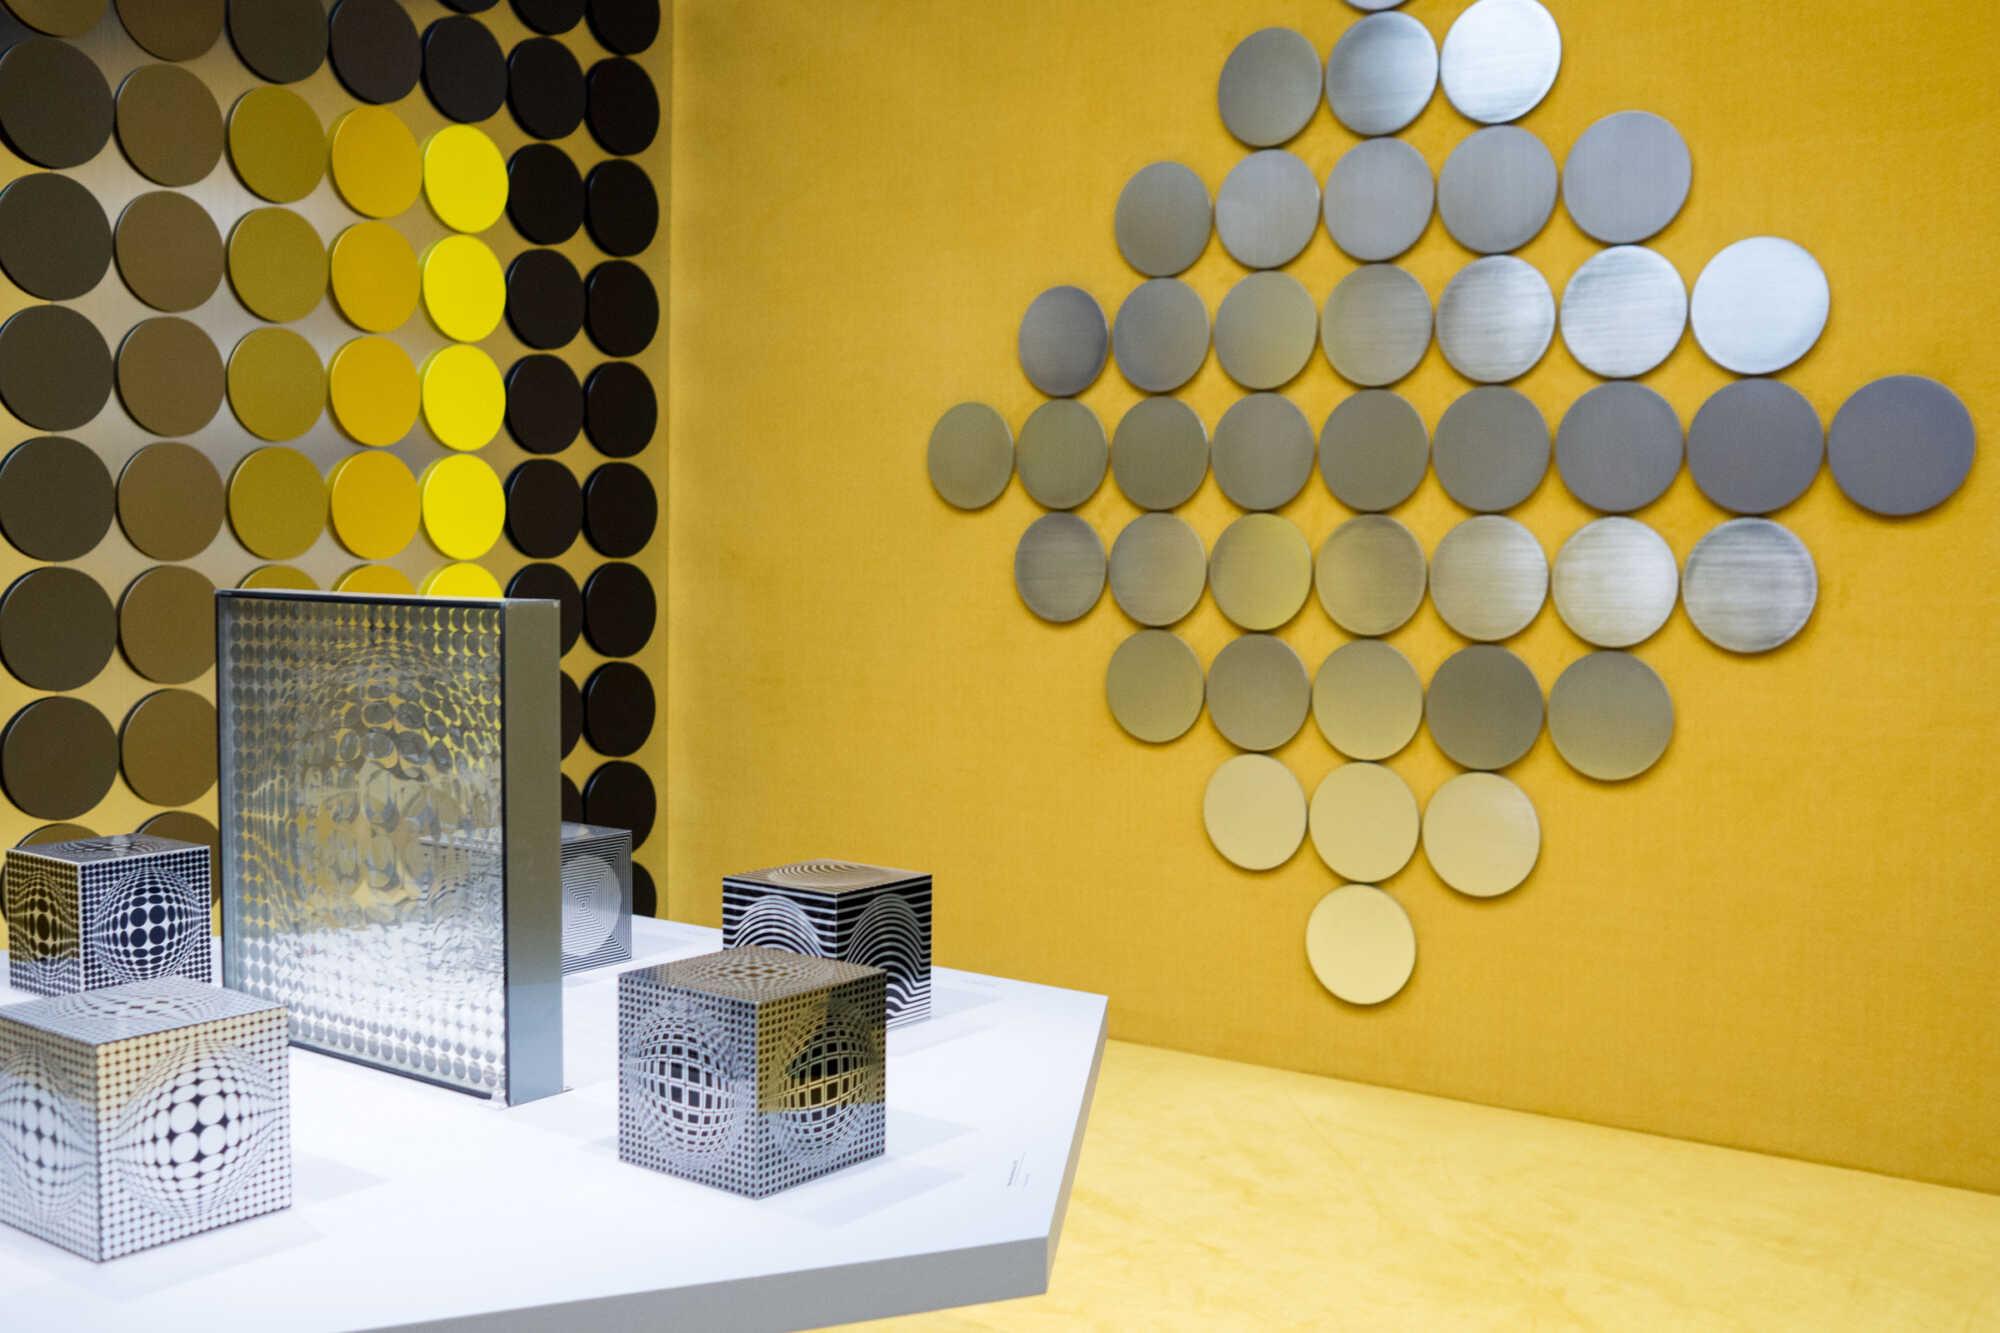 TheWaysBeyond - Centre Pompidou / Vasarely